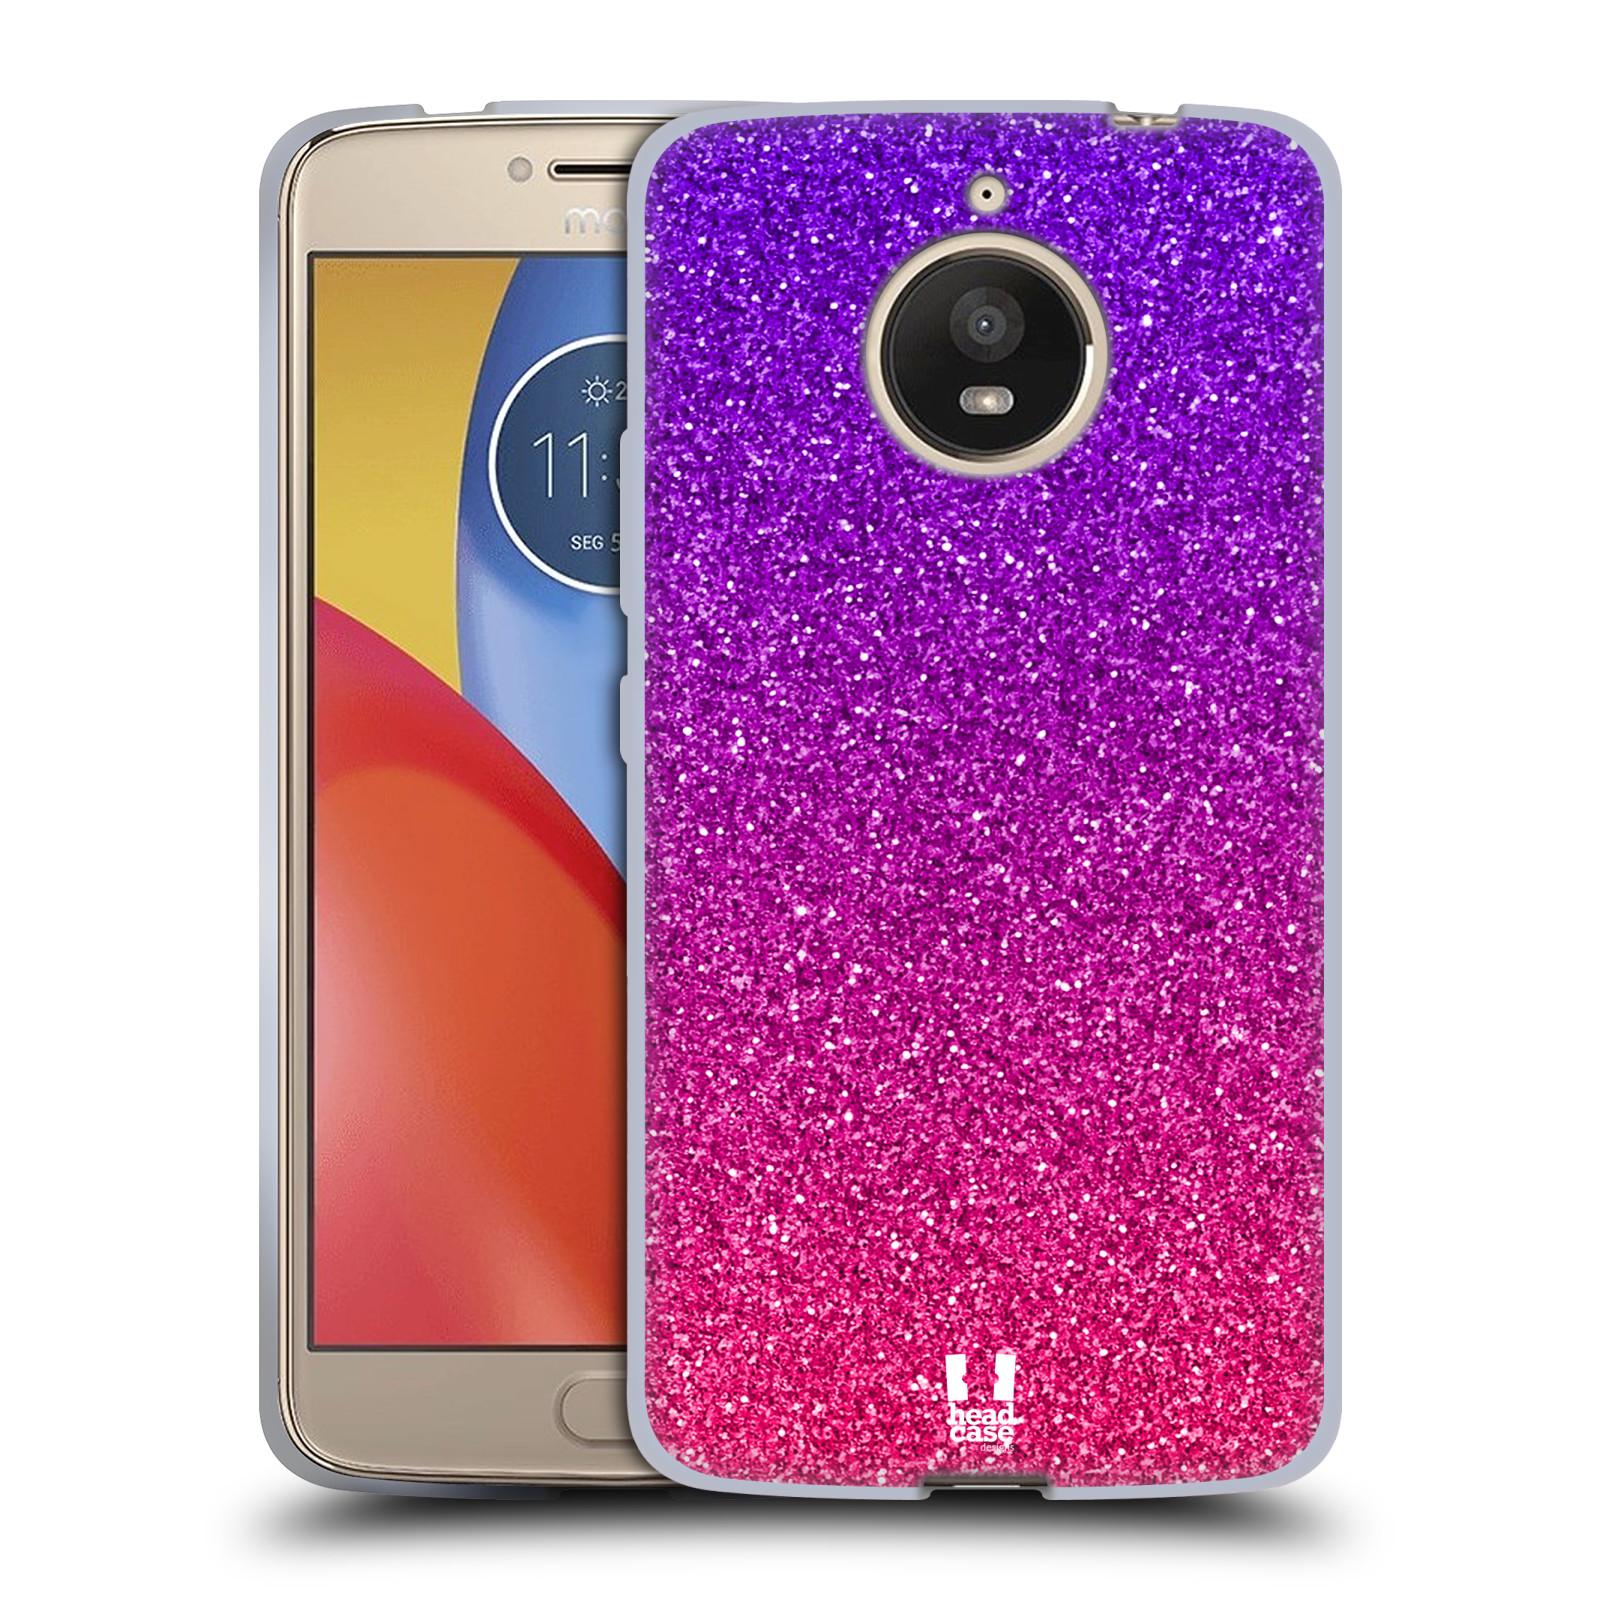 Silikonové pouzdro na mobil Lenovo Moto E4 Plus - Head Case - Mix Pink (Silikonový kryt či obal na mobilní telefon Lenovo Moto E4 Plus s motivem Mix Pink)